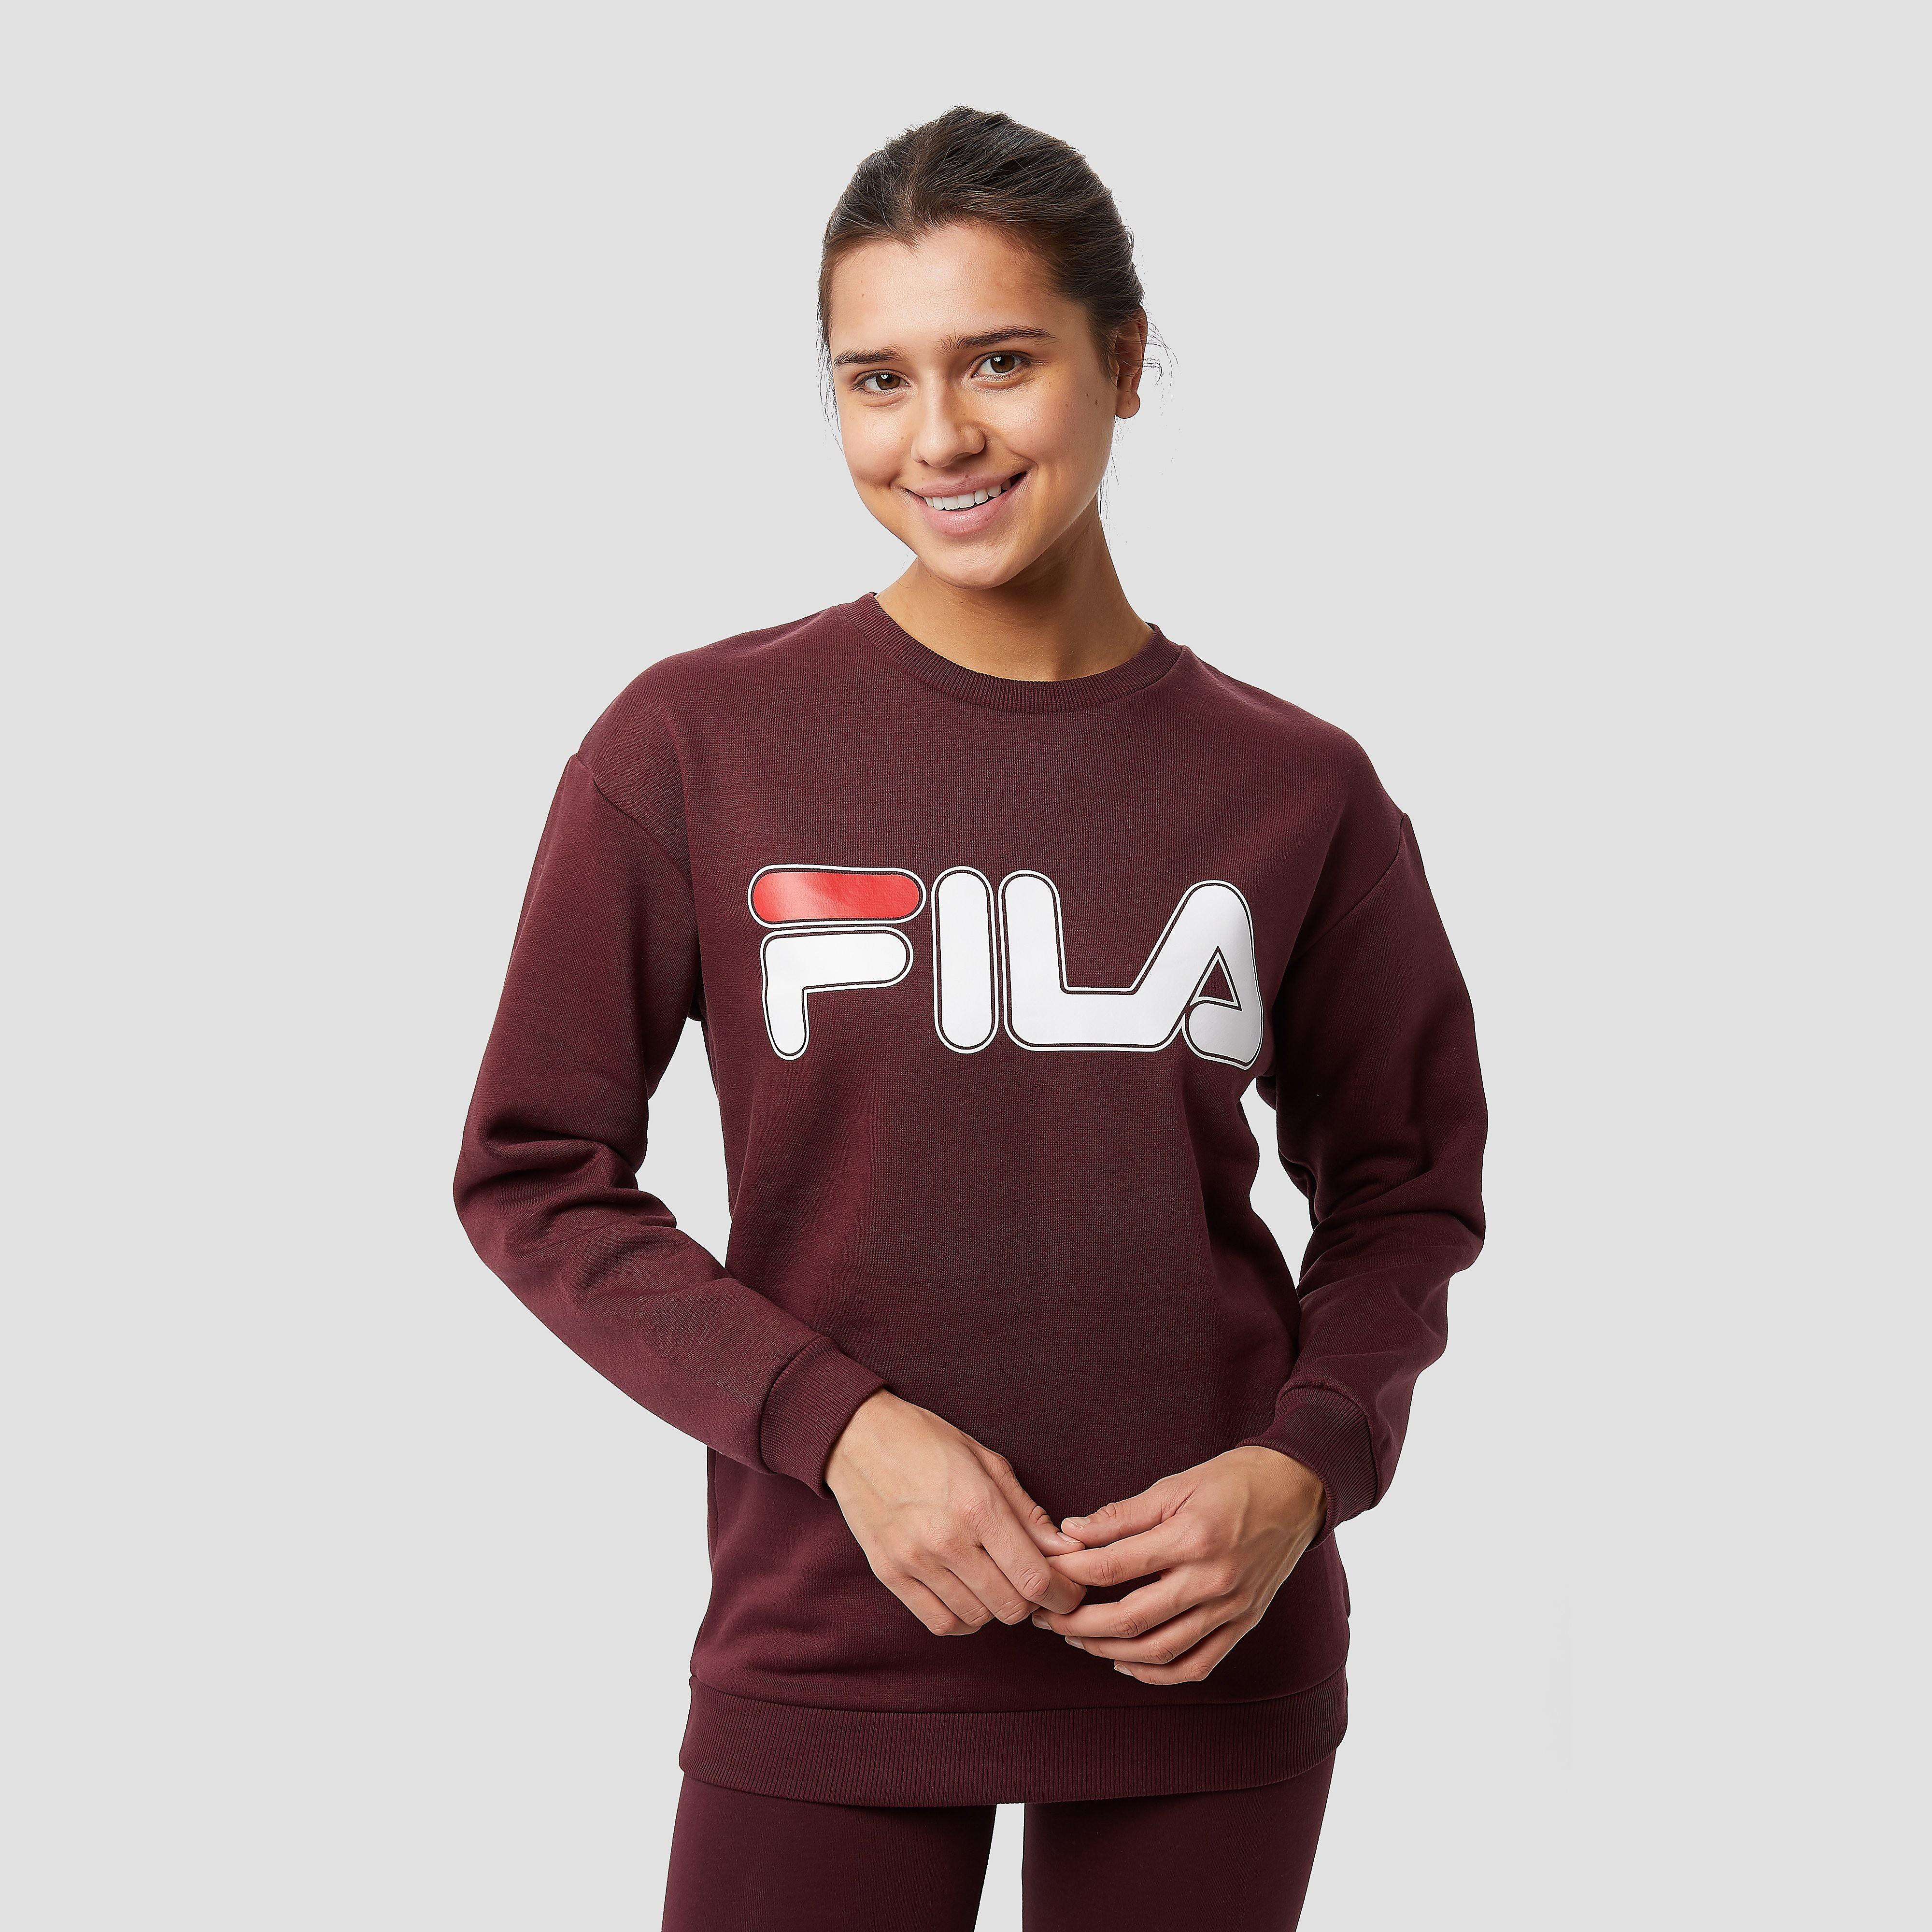 FILA Cydonia 2 crew sweater bordeaux rood dames Dames